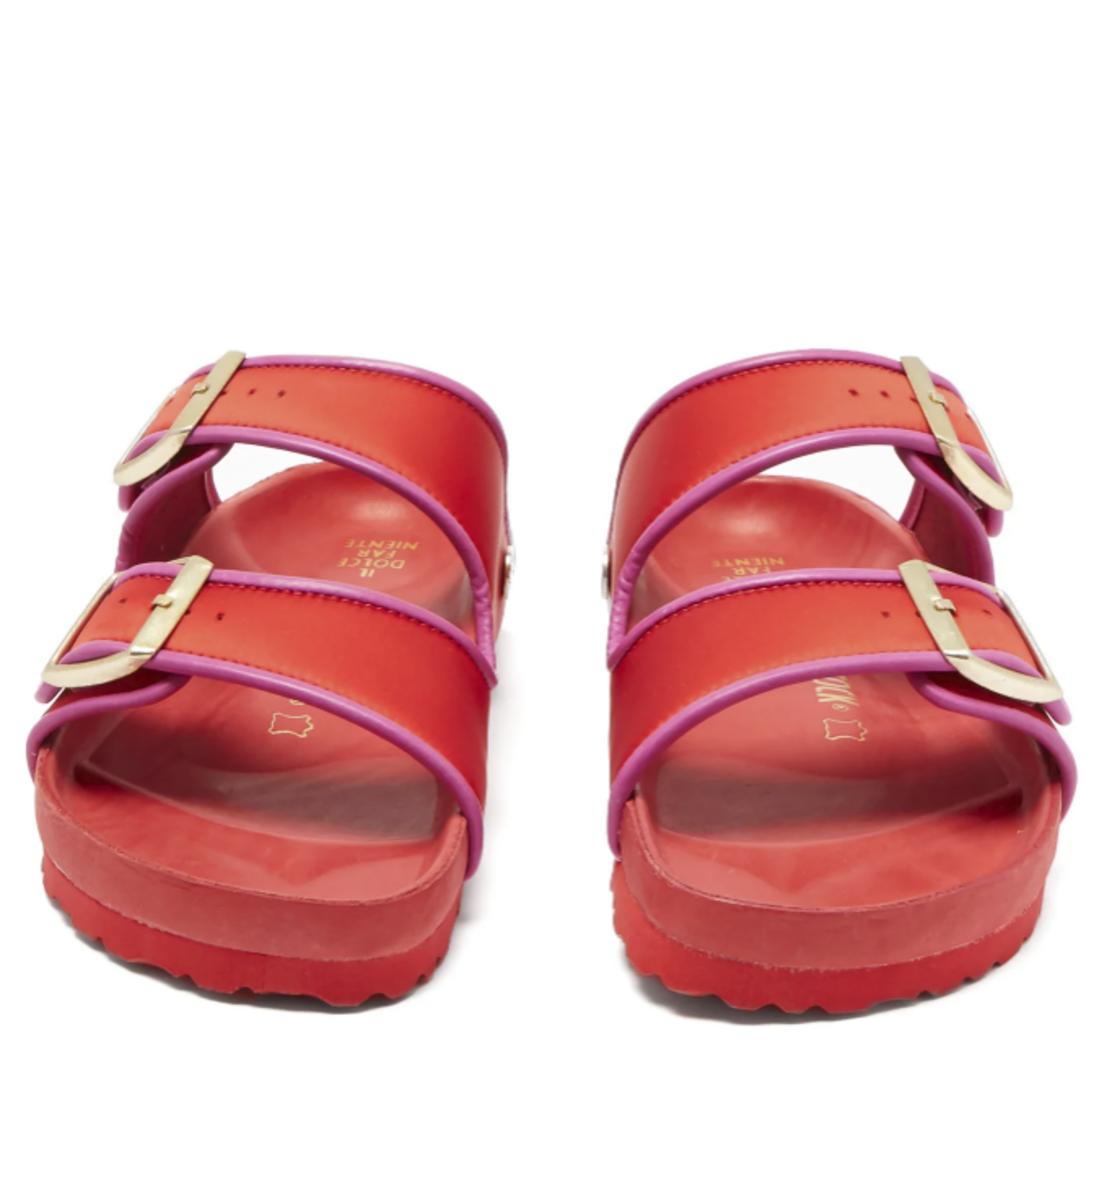 Birkenstock x Il Dolce Far Niente Arizona Fullex Satin Sandals, $460, available here.